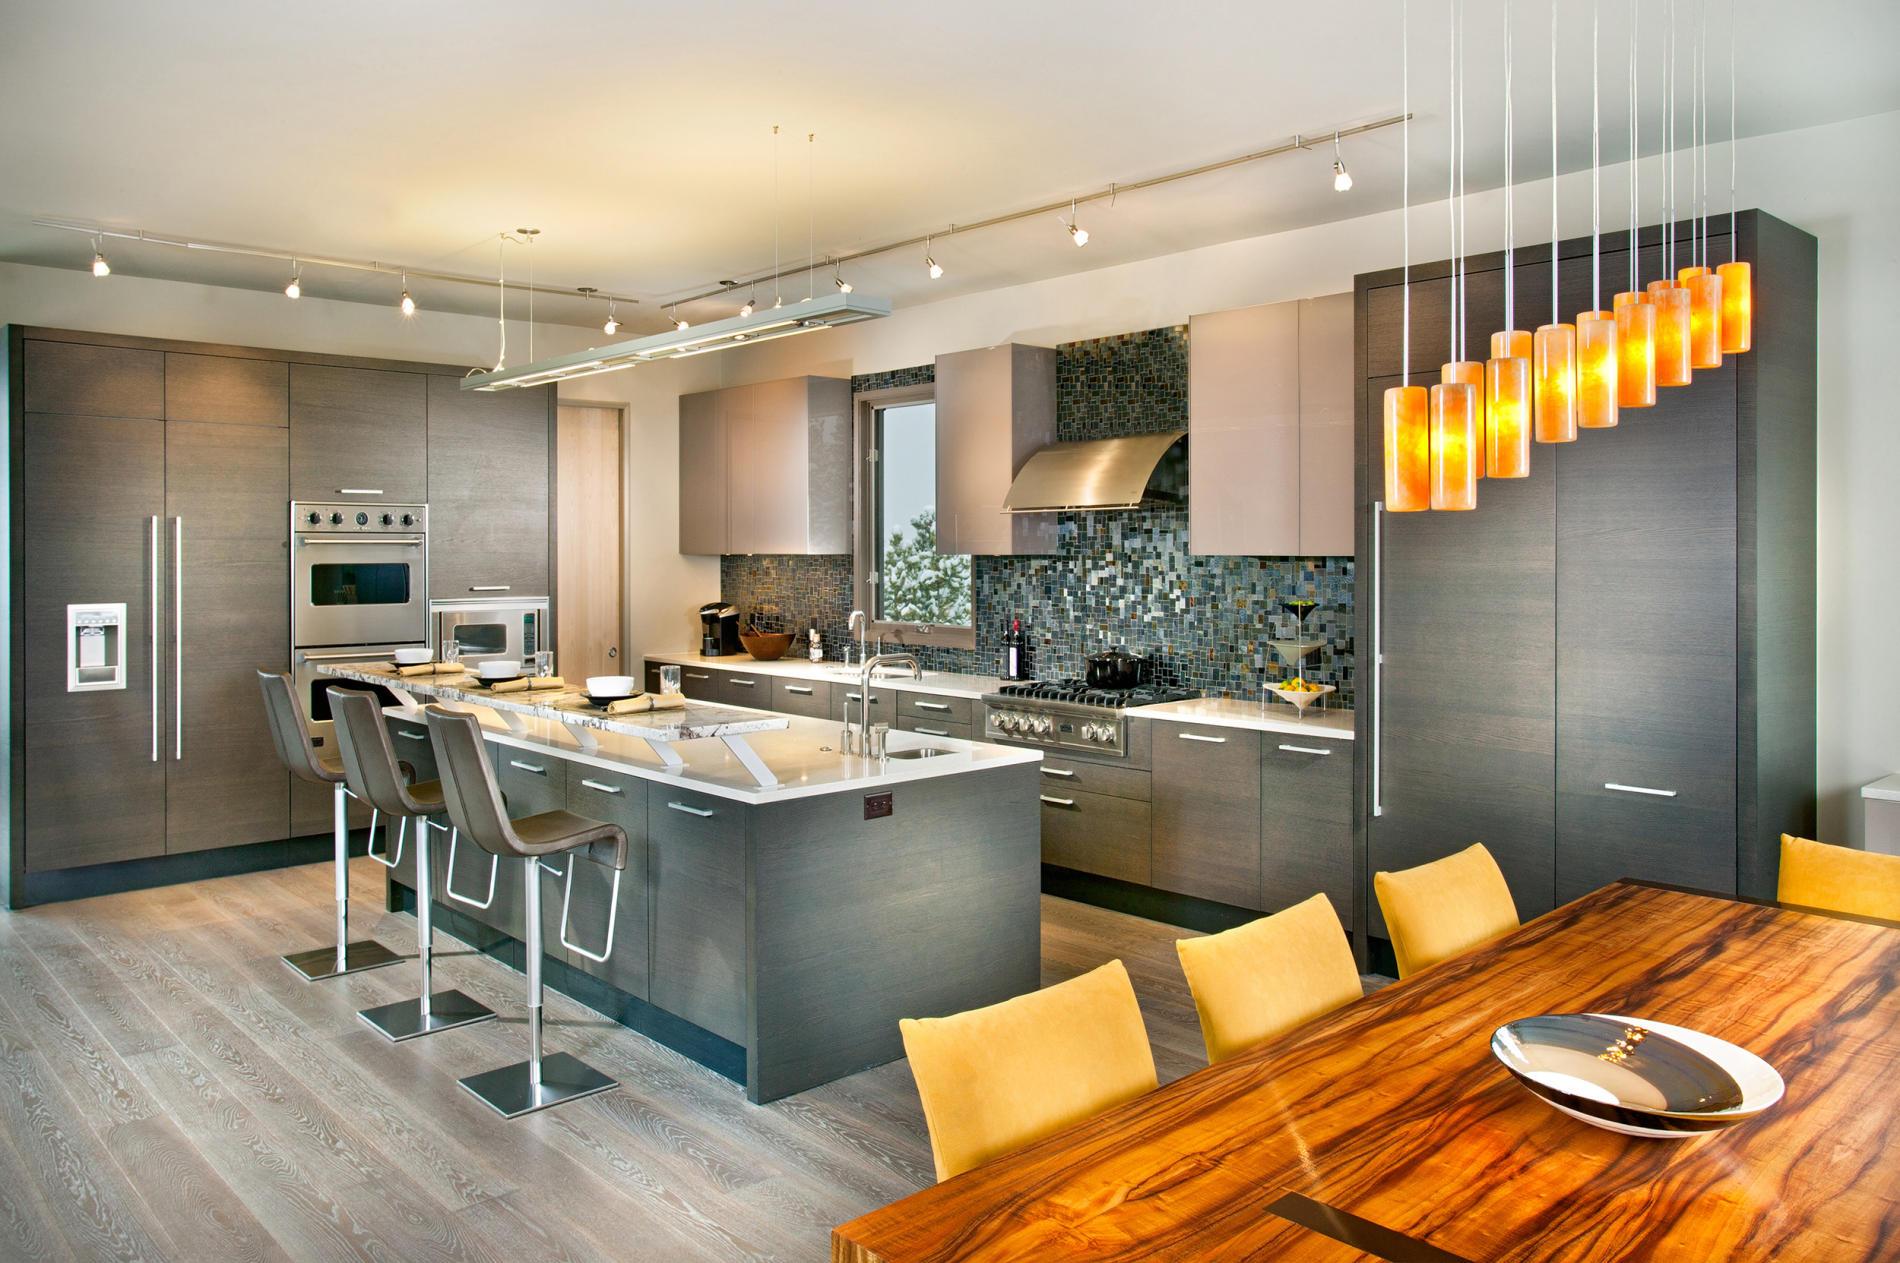 дизайн интерьера кухня пент-хаус.jpg